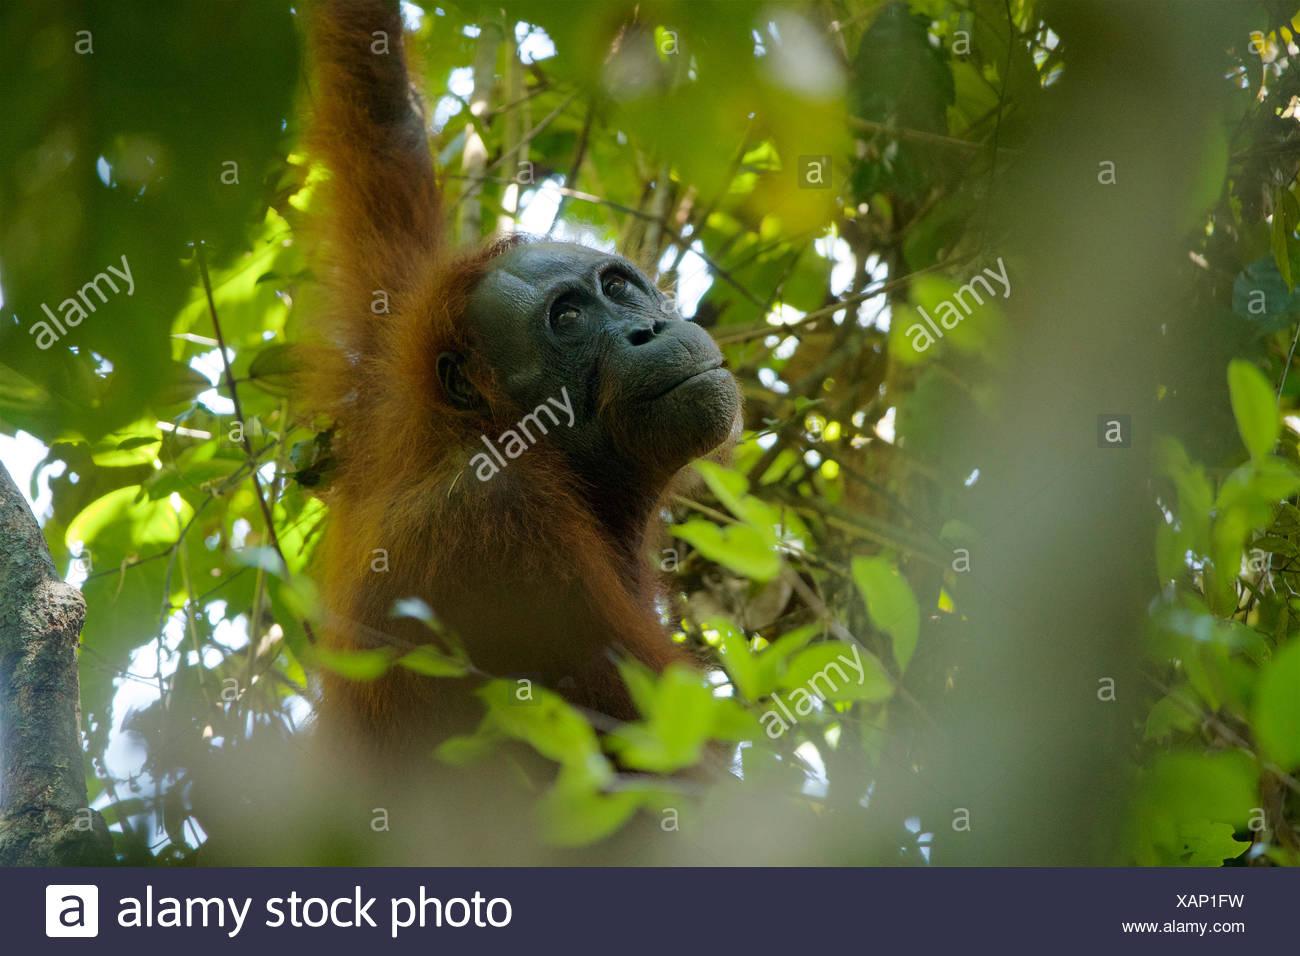 An adult female Bornean orangutan, Pongo pygmaeus wurmbii, rests in a tree in Gunung Palung National Park. - Stock Image